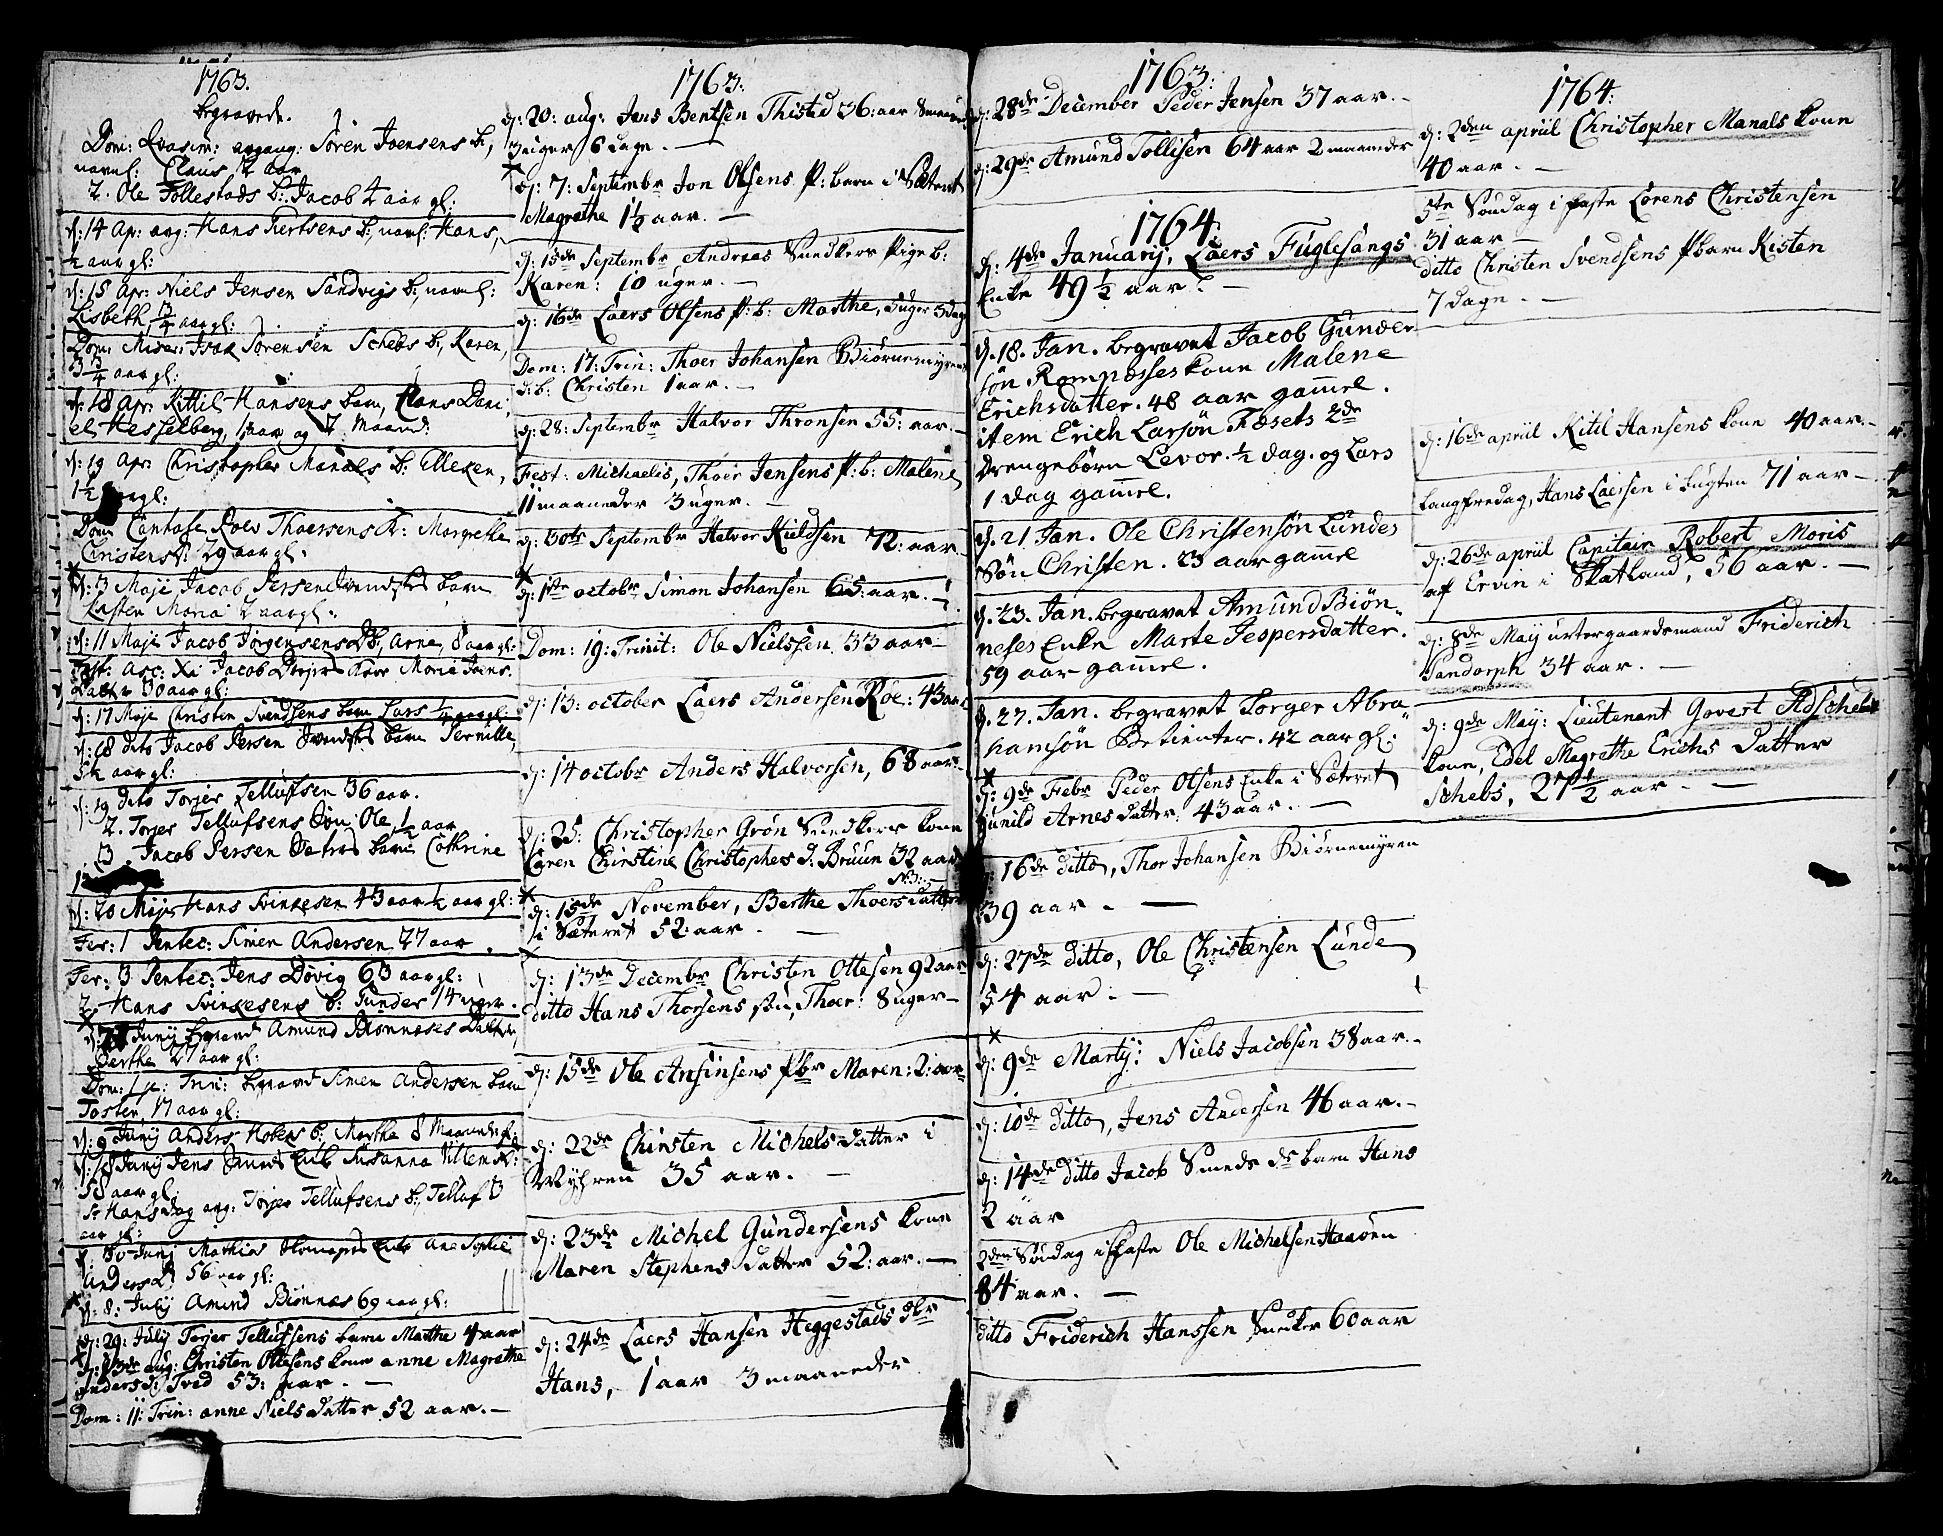 SAKO, Brevik kirkebøker, F/Fa/L0002: Ministerialbok nr. 2, 1720-1764, s. 58g